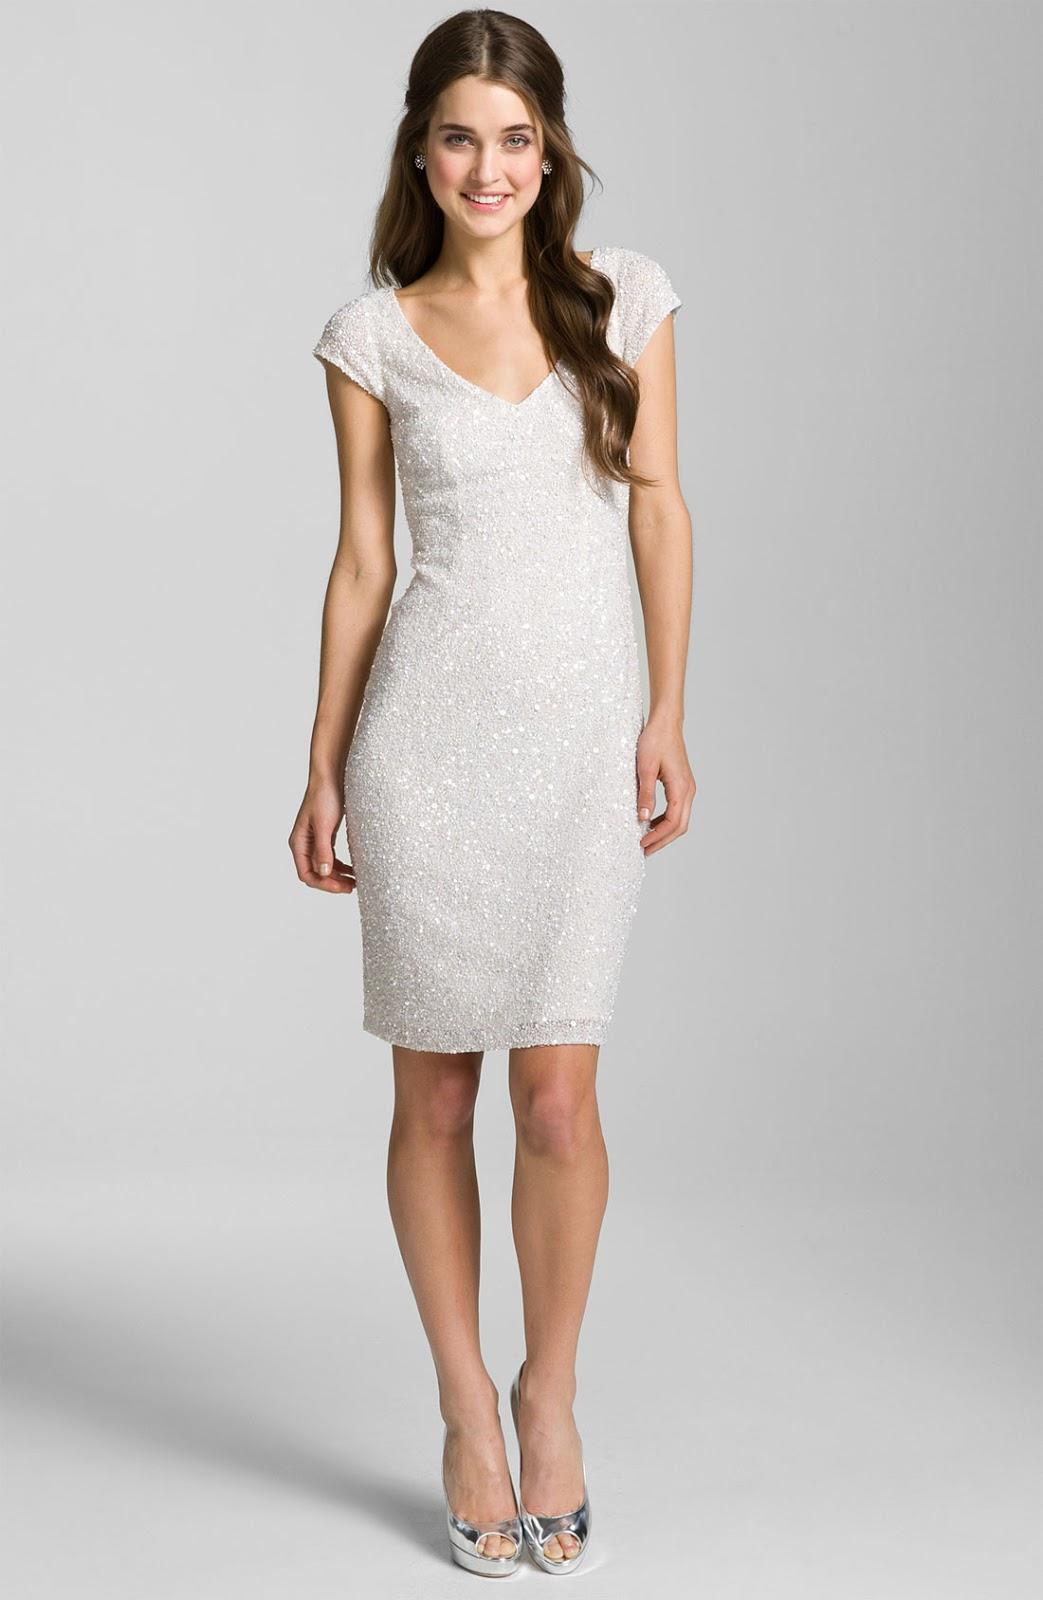 WhiteAzalea Sheath Dresses: January 2013